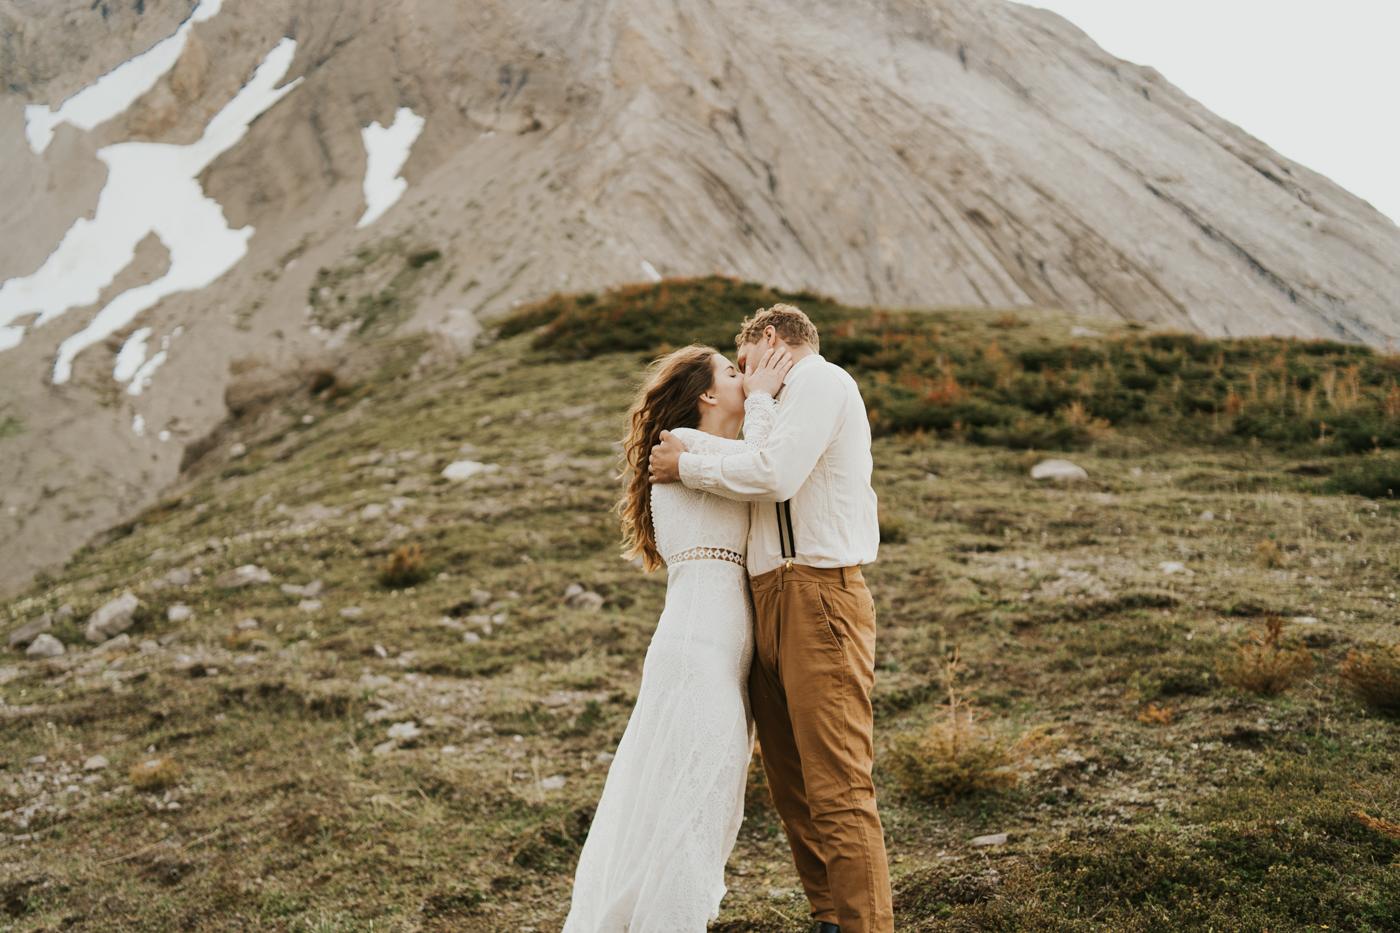 tyraephotography_photographer_wedding_elopement_engagement_photography-07891.jpg